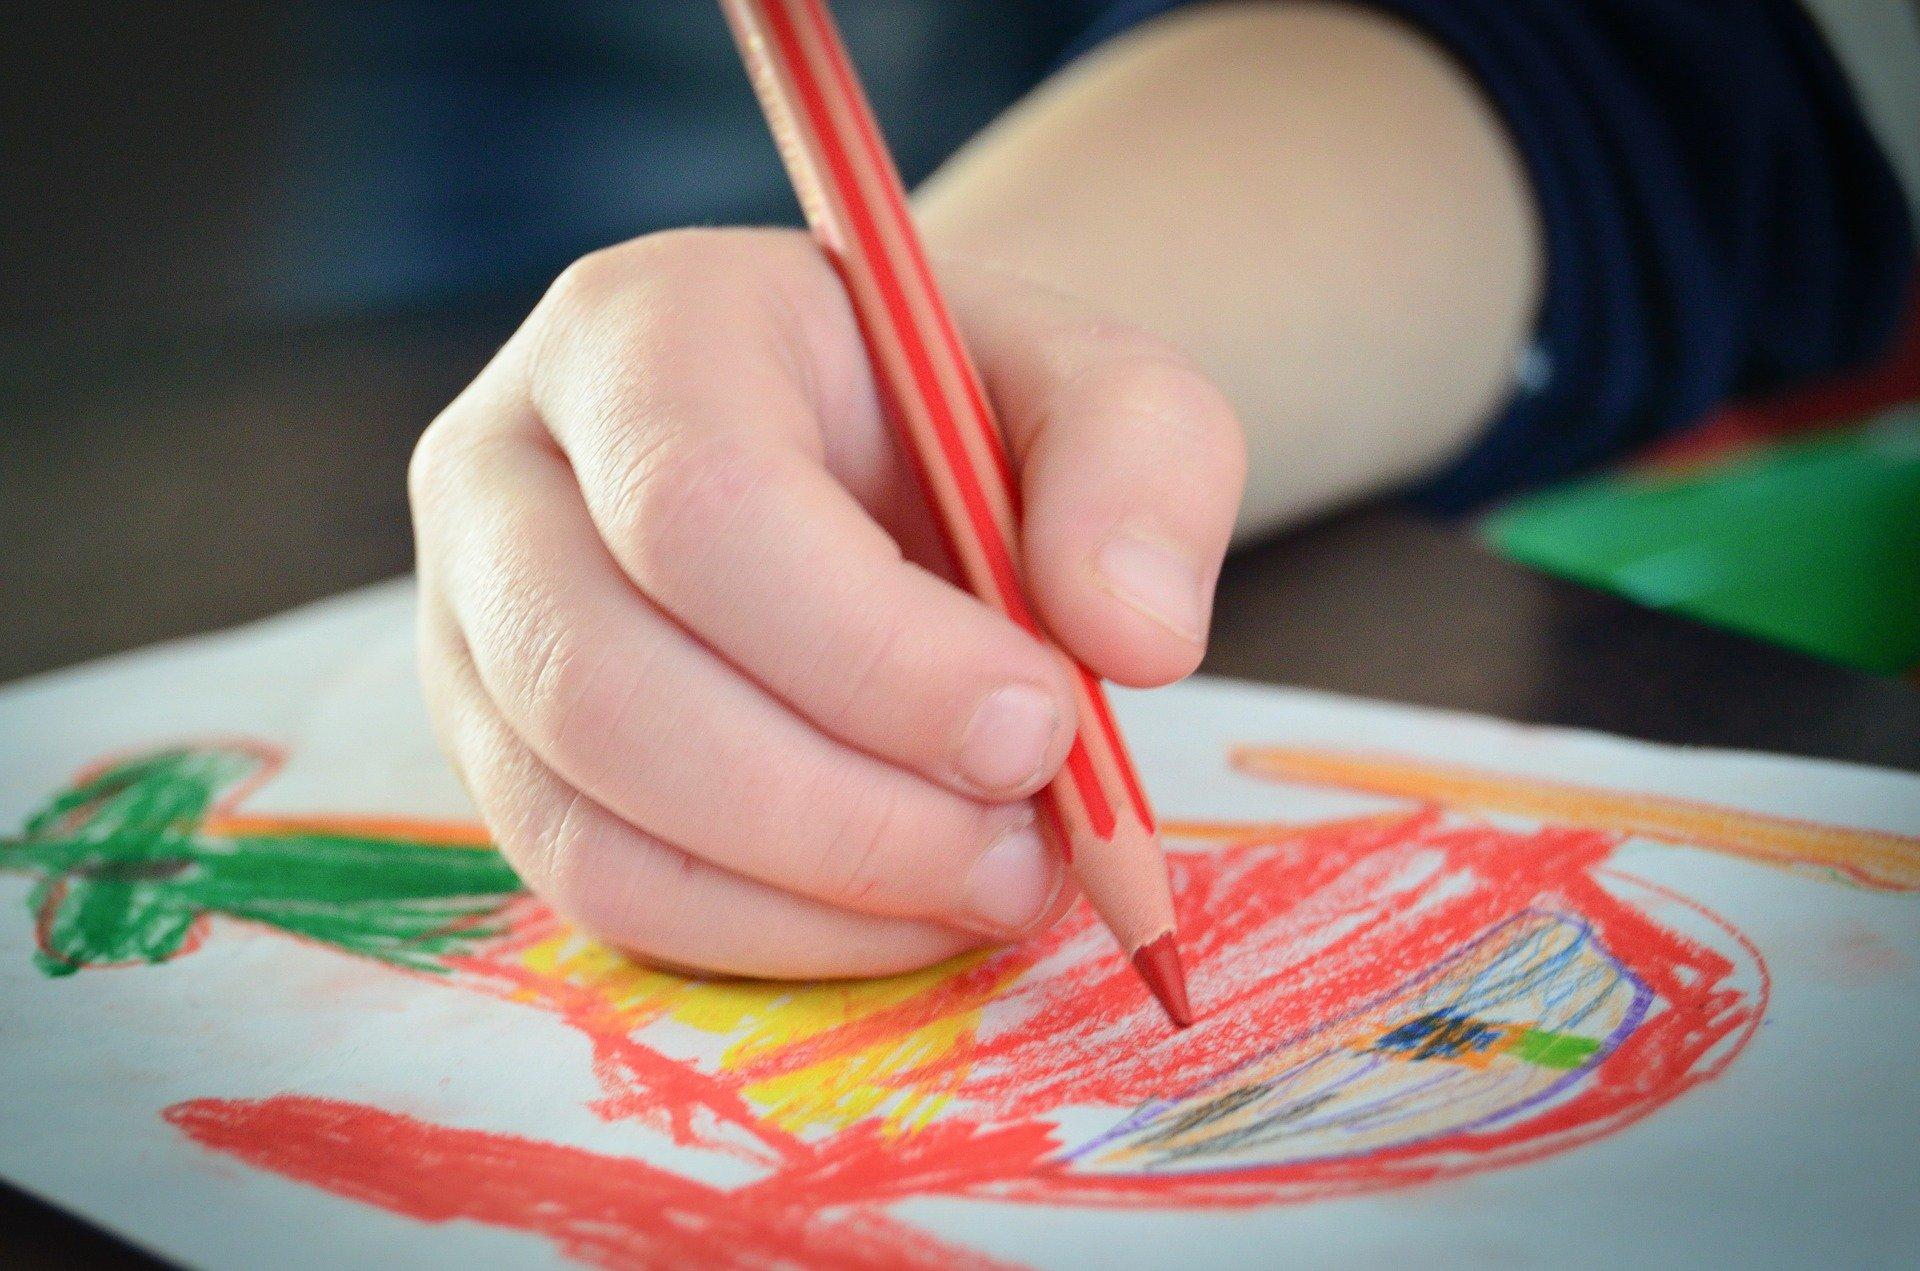 Dziecko ręka rysunek